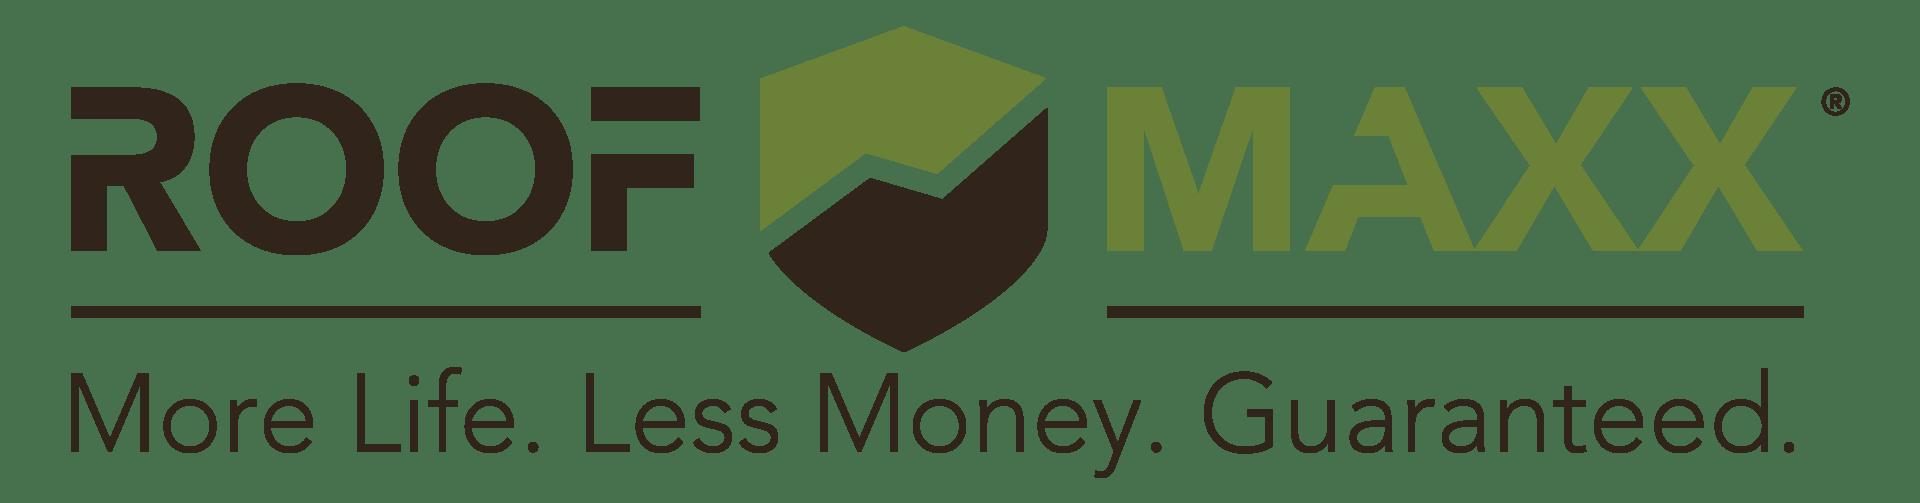 ROOF MAXX logo. More Life. Less Money. Guaranteed.